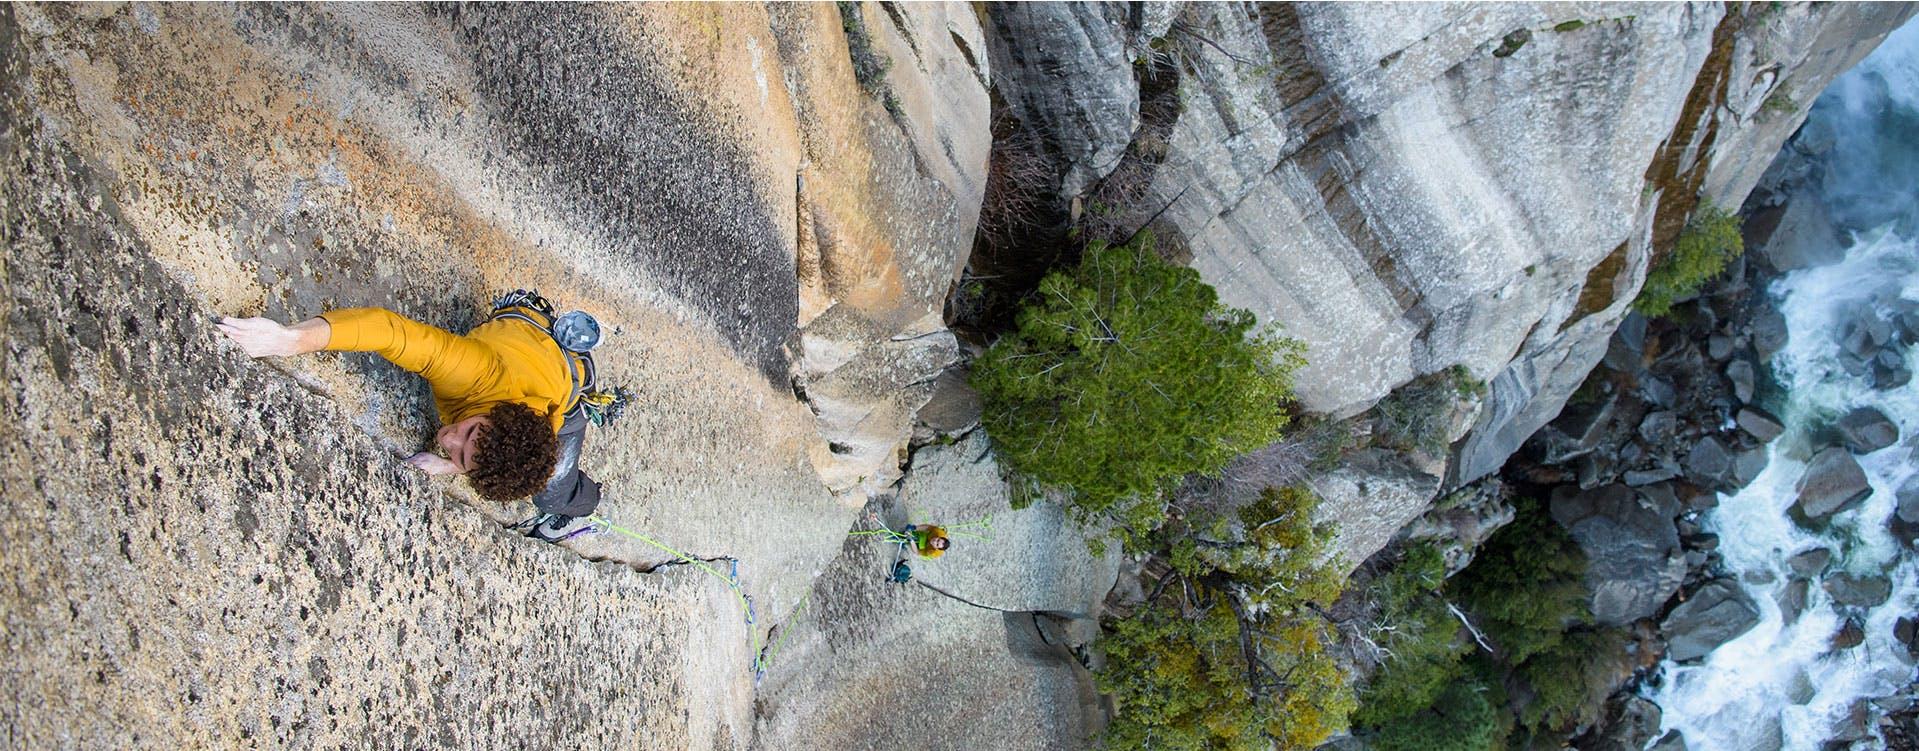 man climbing a crack